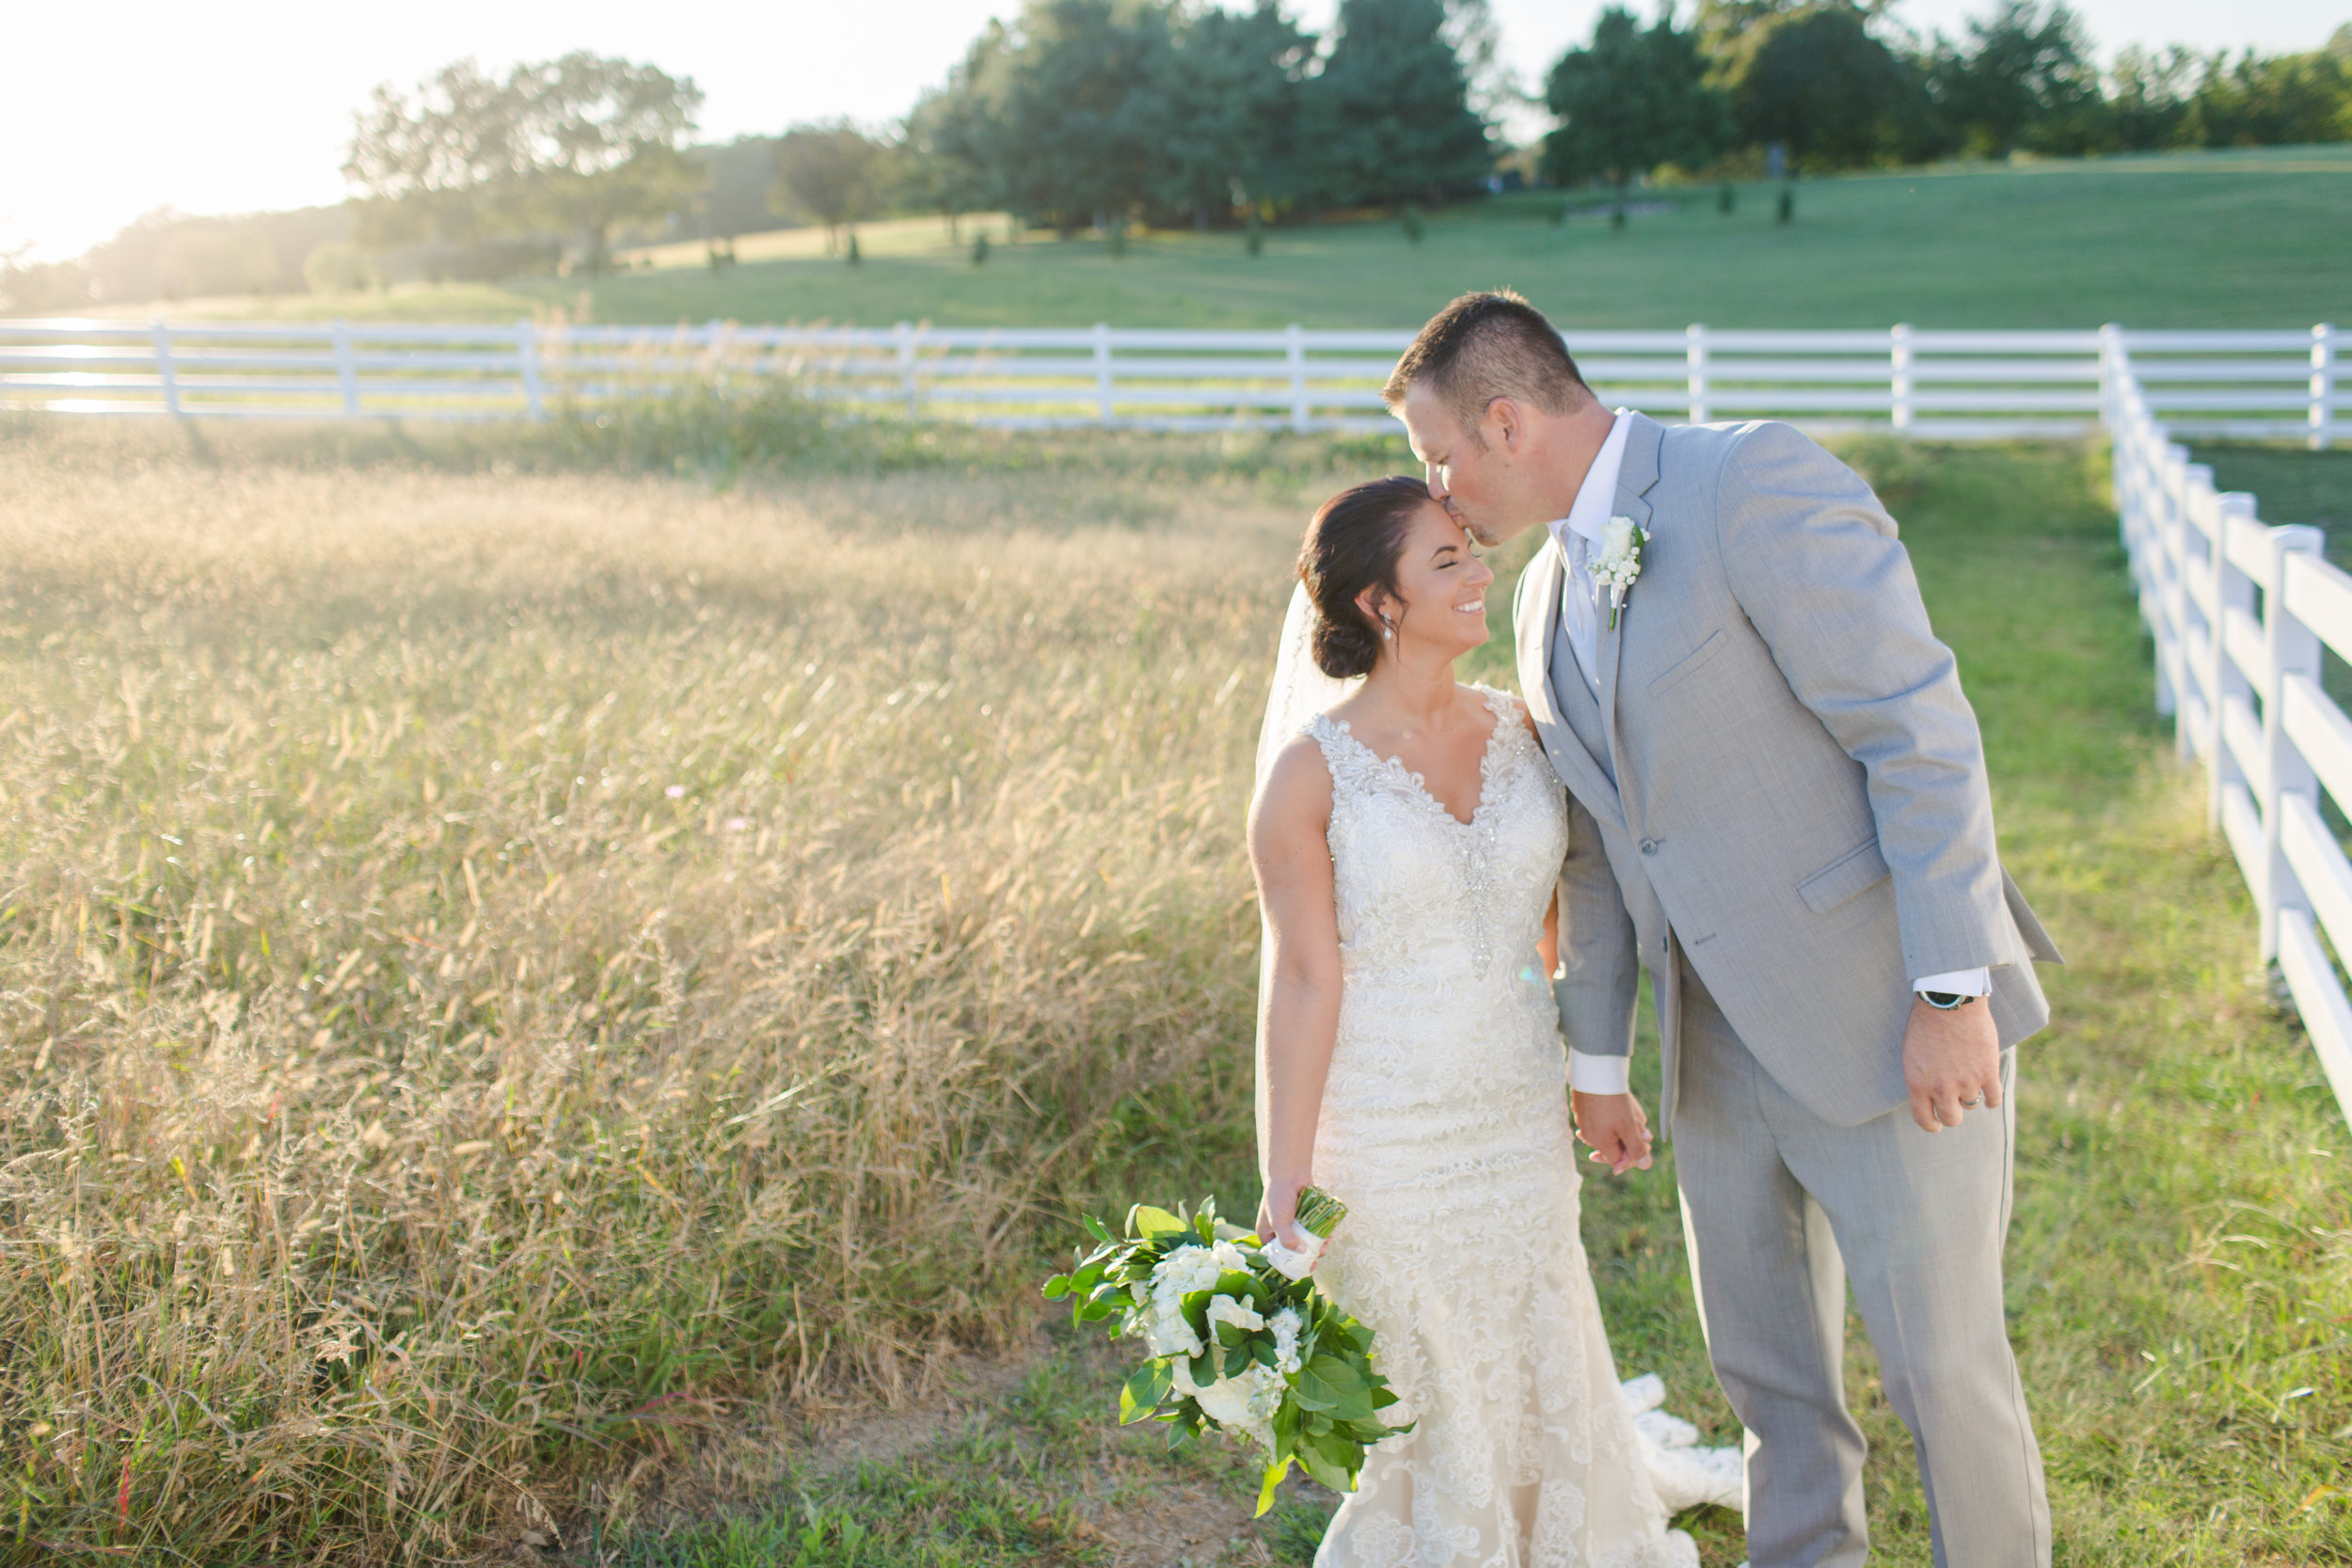 KYLIE + PAUL - Kansas City wedding at Eighteen Ninety, September 2017 // Photography: Pond Photography